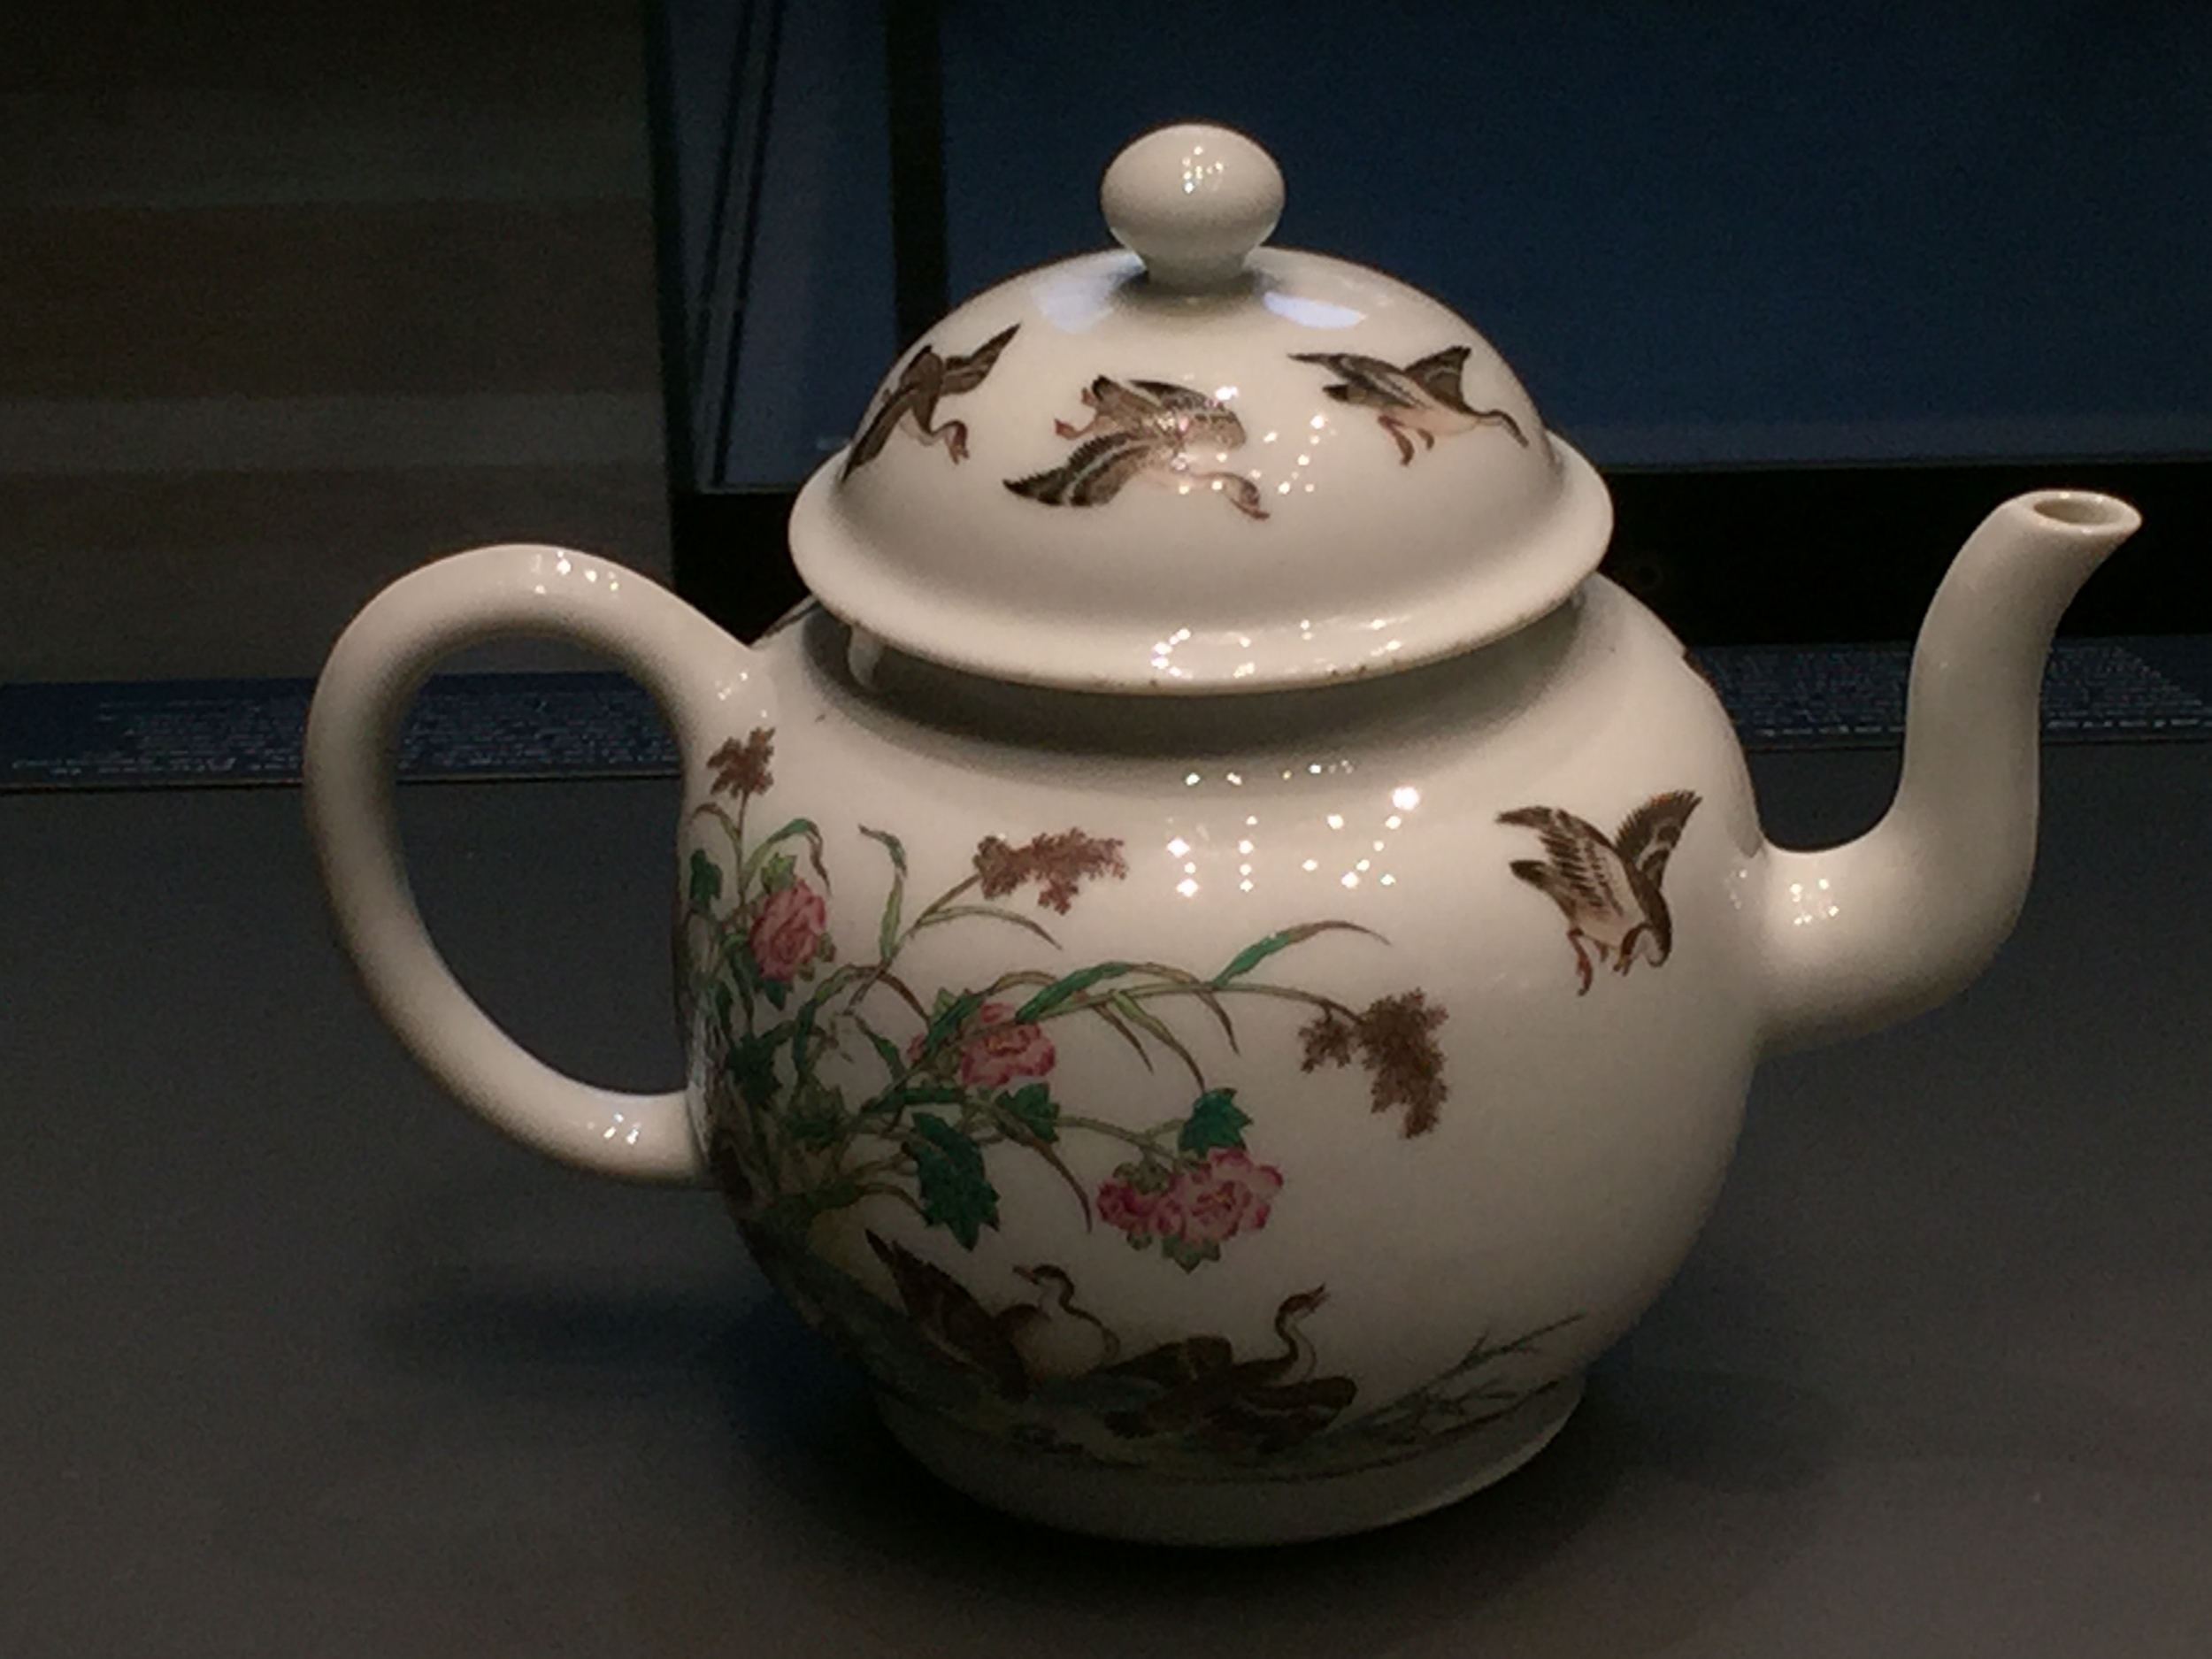 Chinese-Porcelain-British-Museum-Percival-David-jessewaugh.com-90.jpg